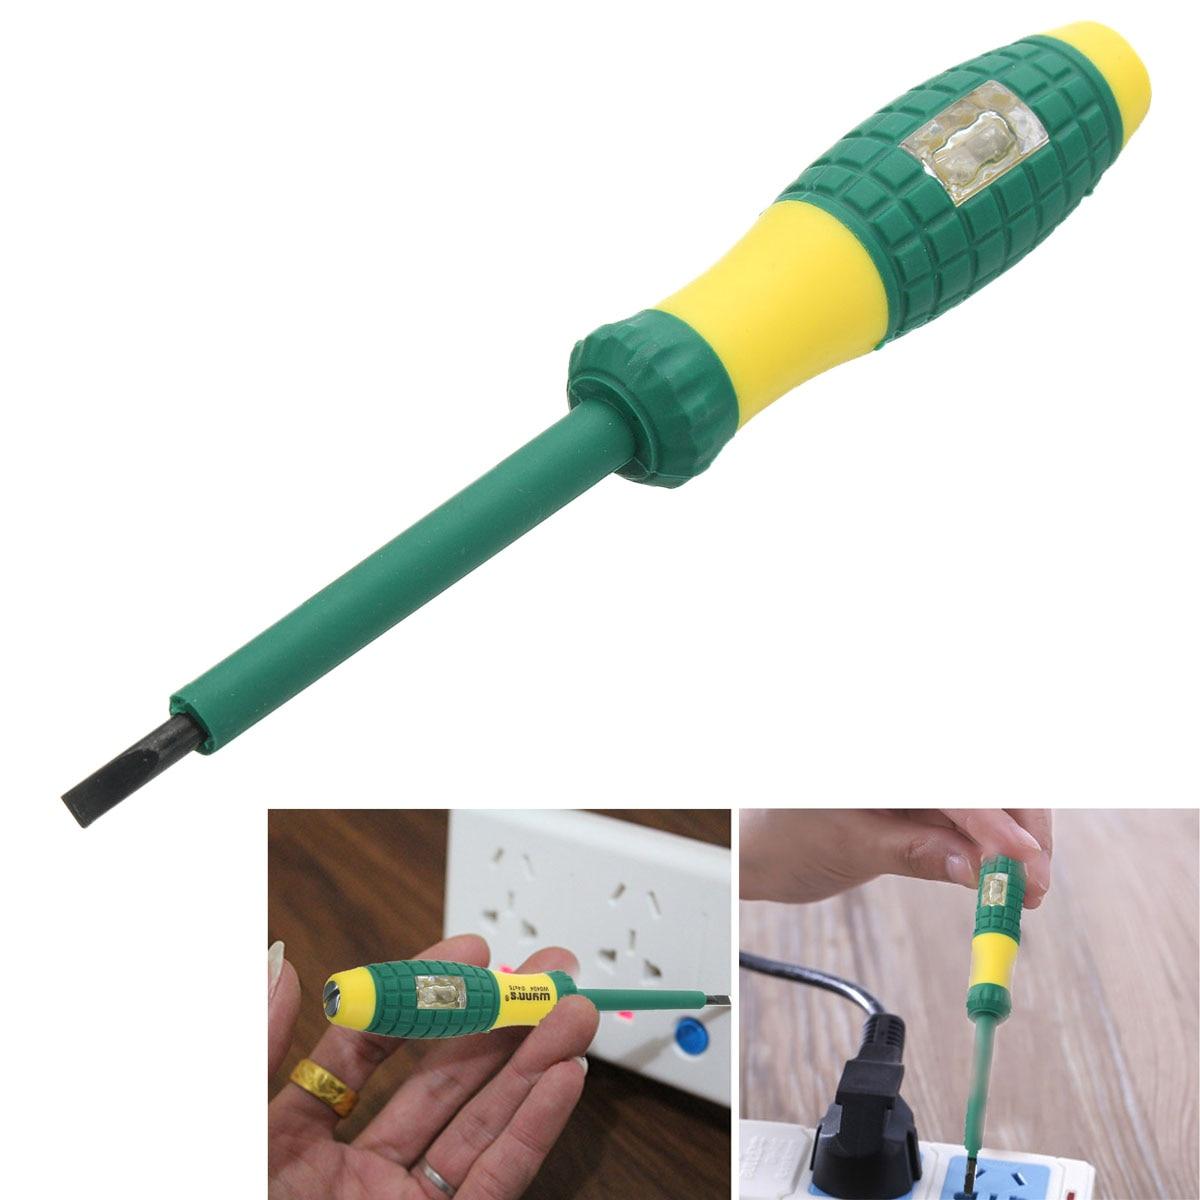 220V Electrical Tester Pen Screwdriver With Voltage Power Indicator Light-Shape